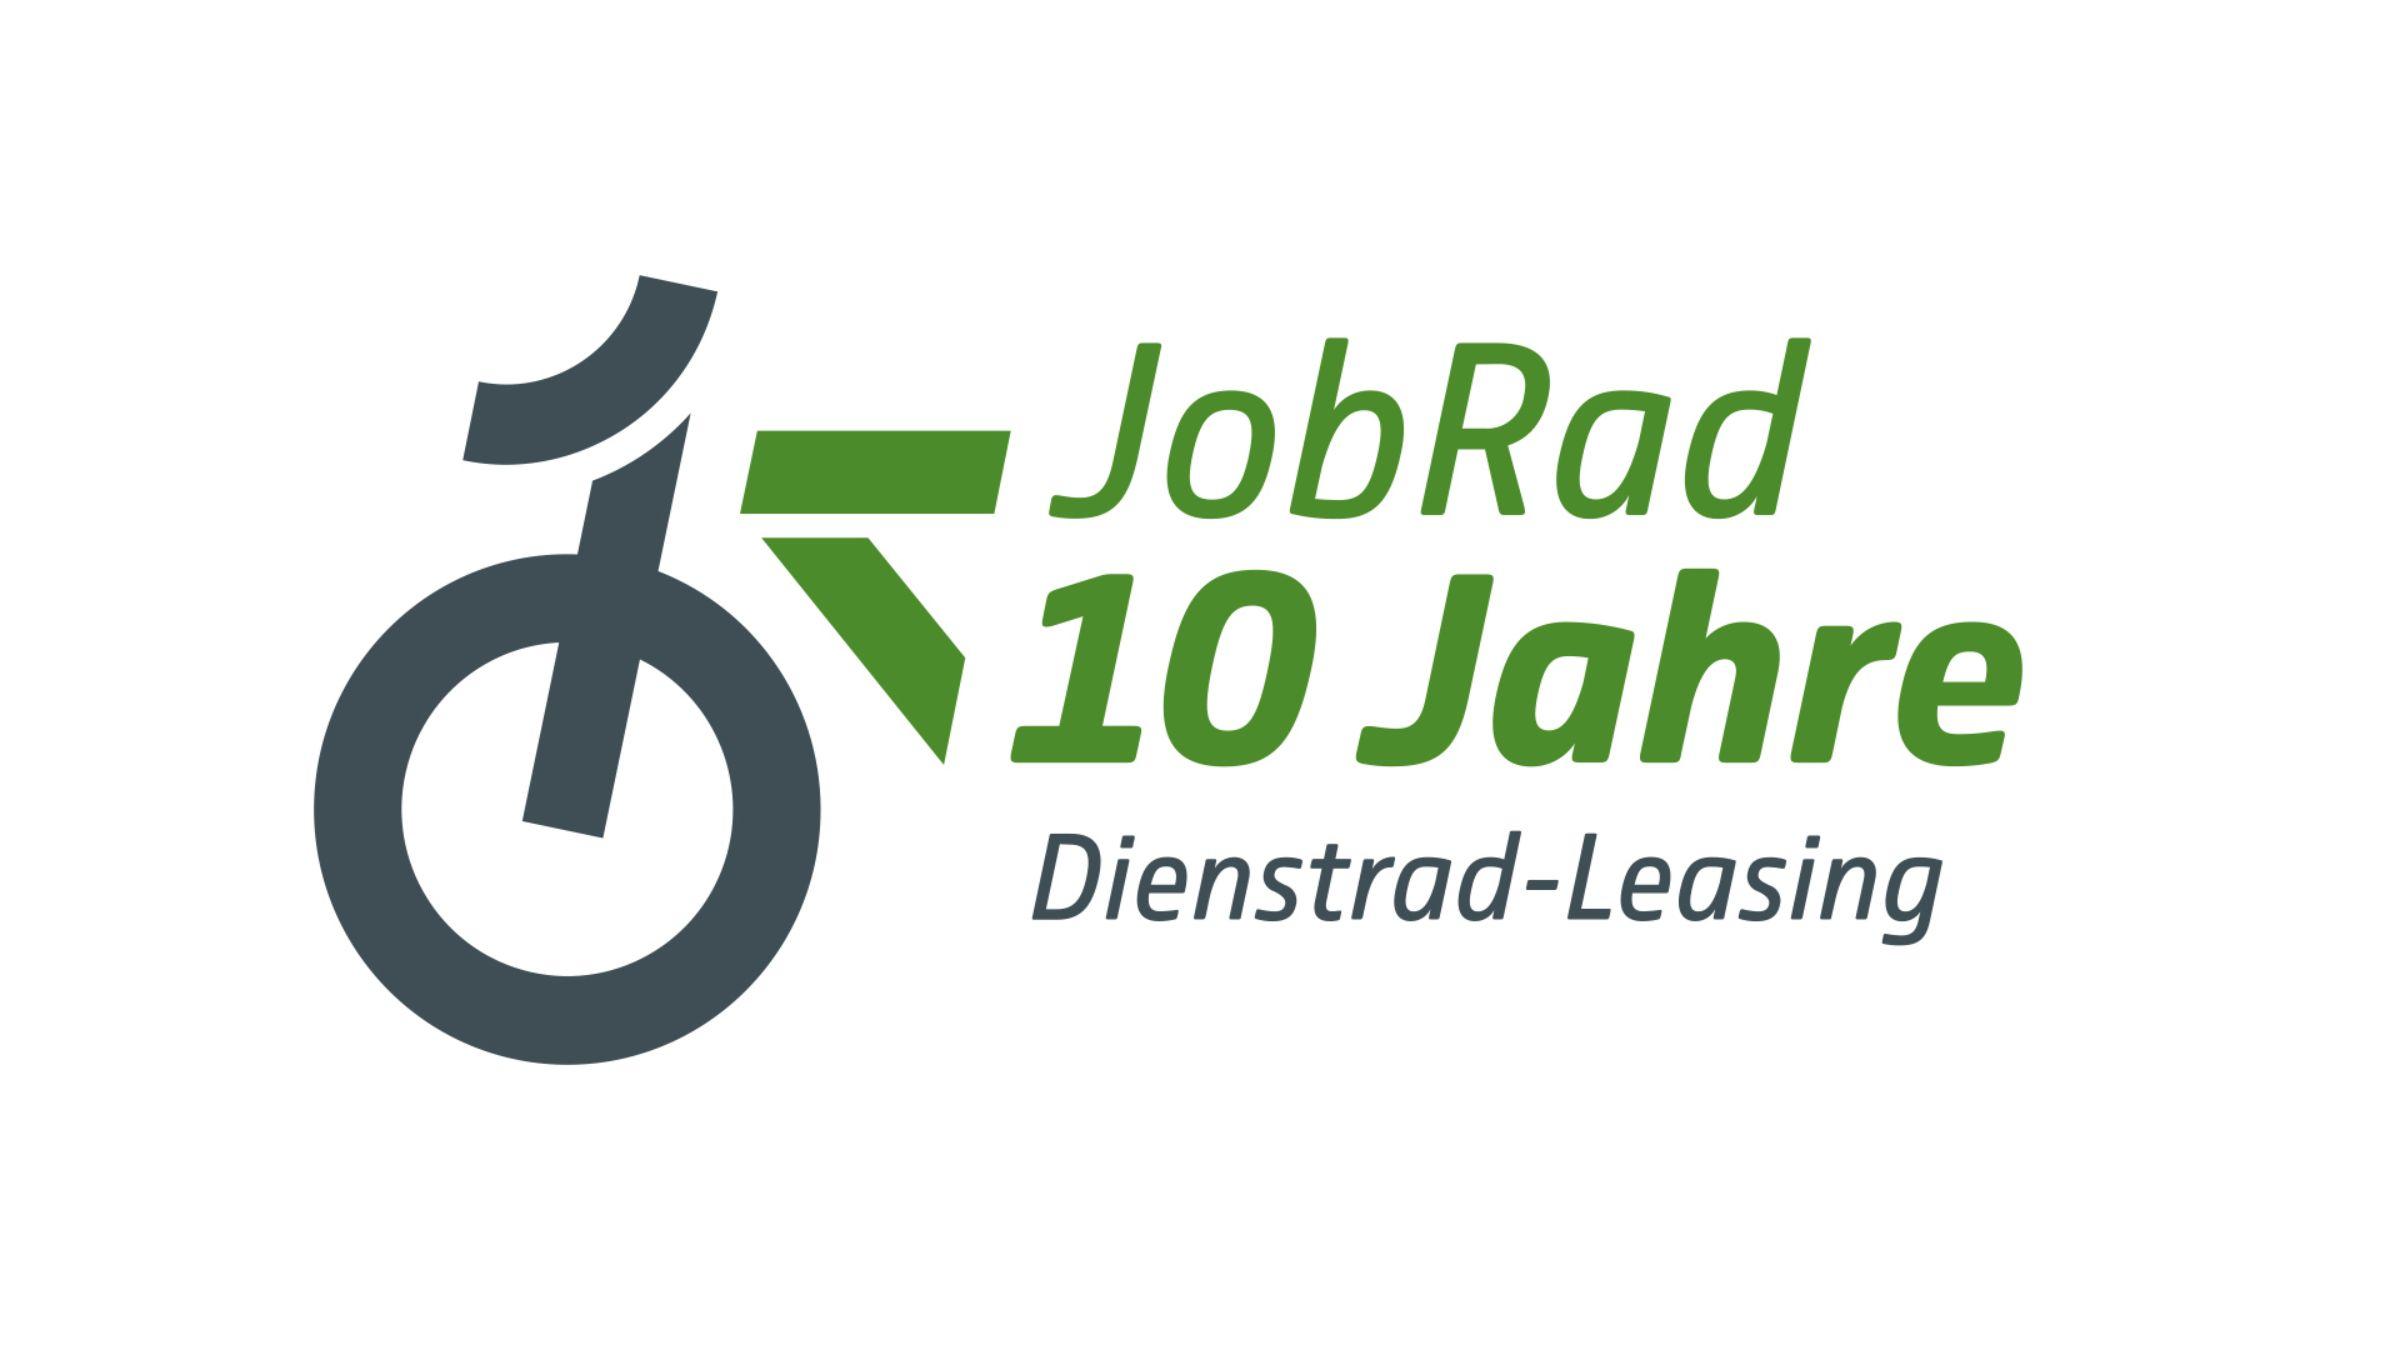 JobRad-Logo 10 Jahre Dienstrad-Leasing